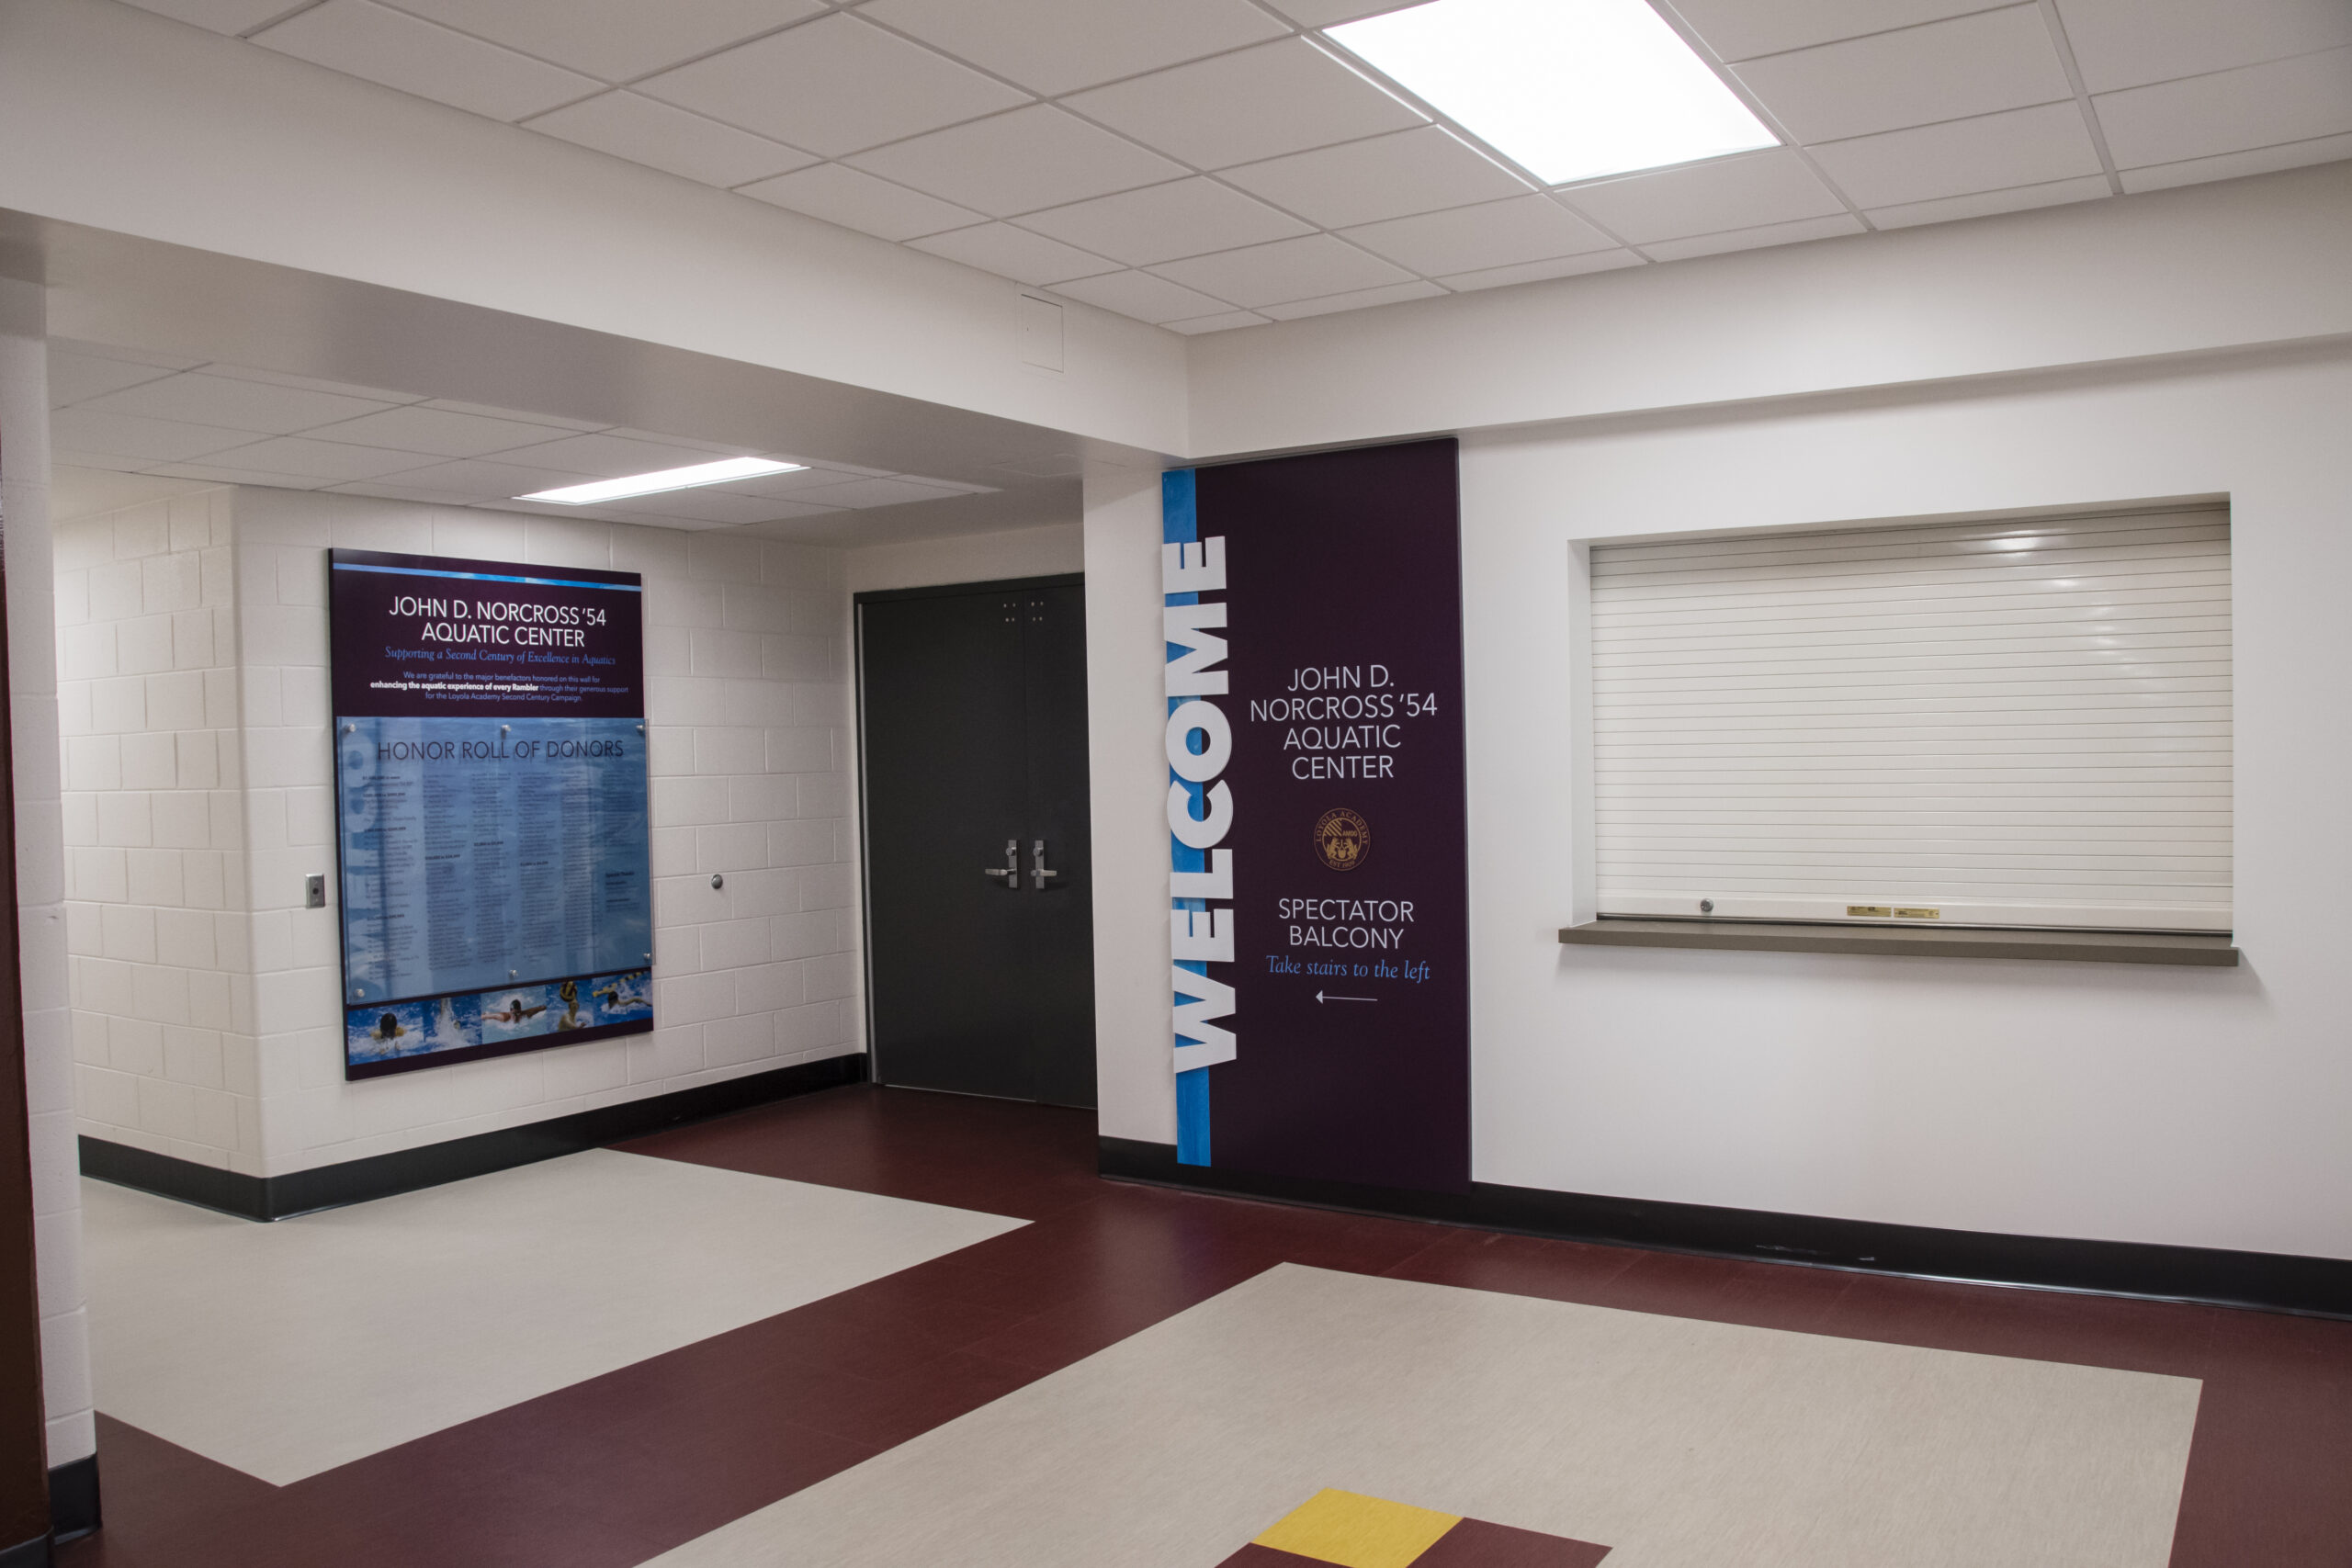 Interior hallway of Loyola Academy Aquatic Center.